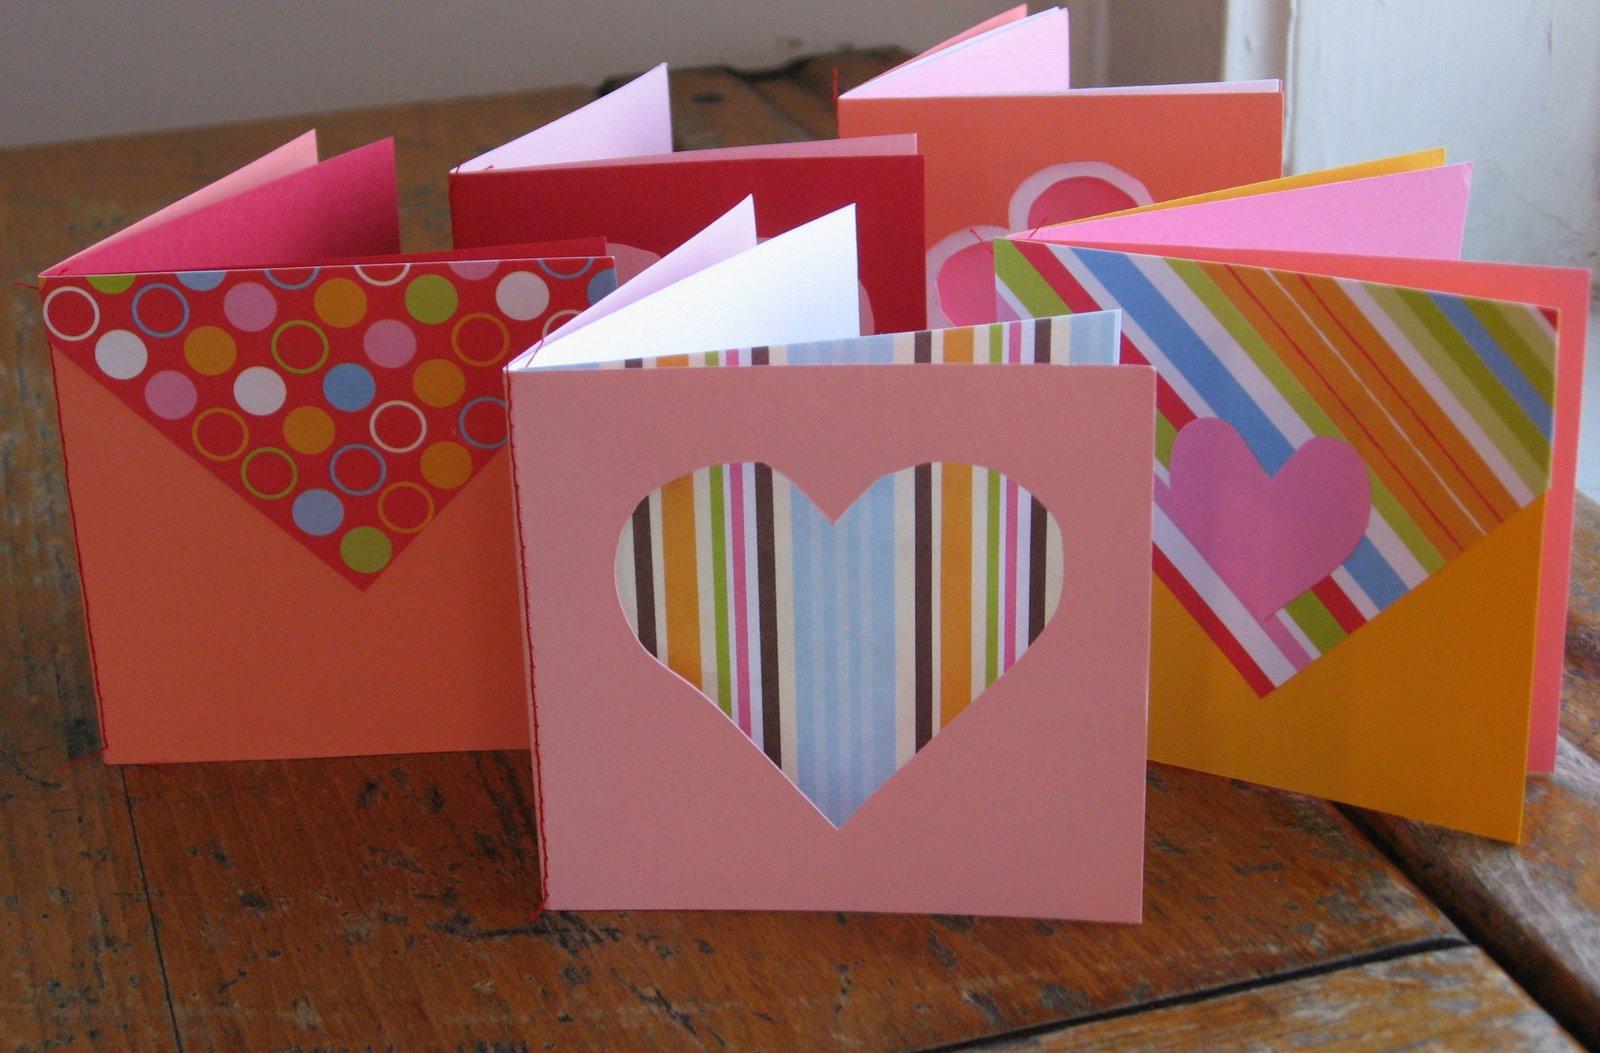 Blog dicas de lbuns scrapbook para o - Manualidades romanticas para hombres ...